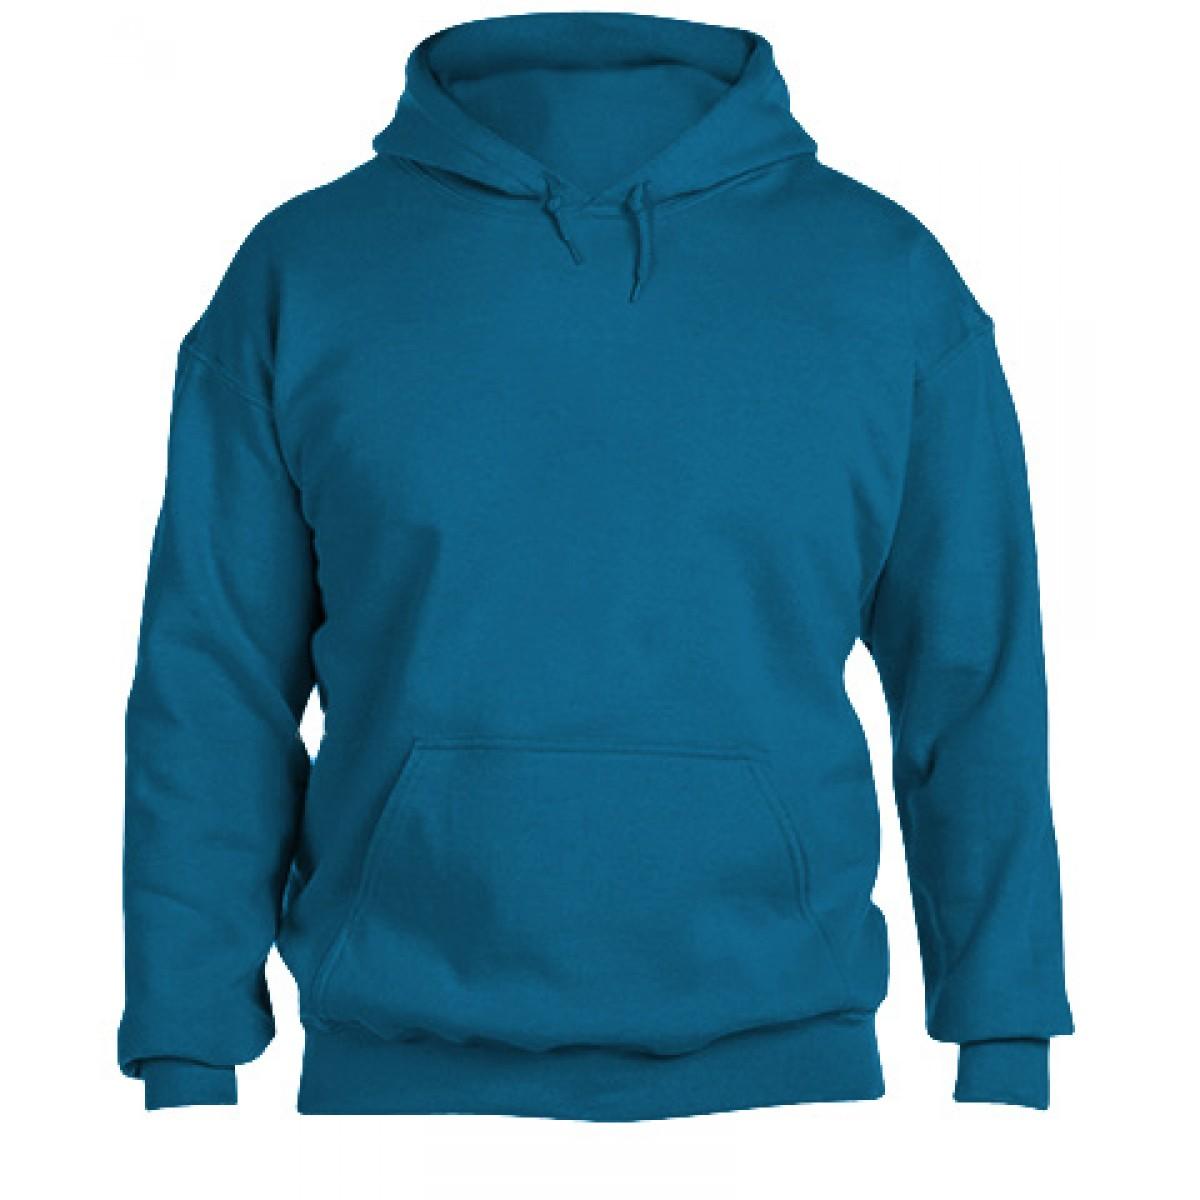 Hooded Sweatshirt 50/50 Heavy Blend -Sapphire-XL